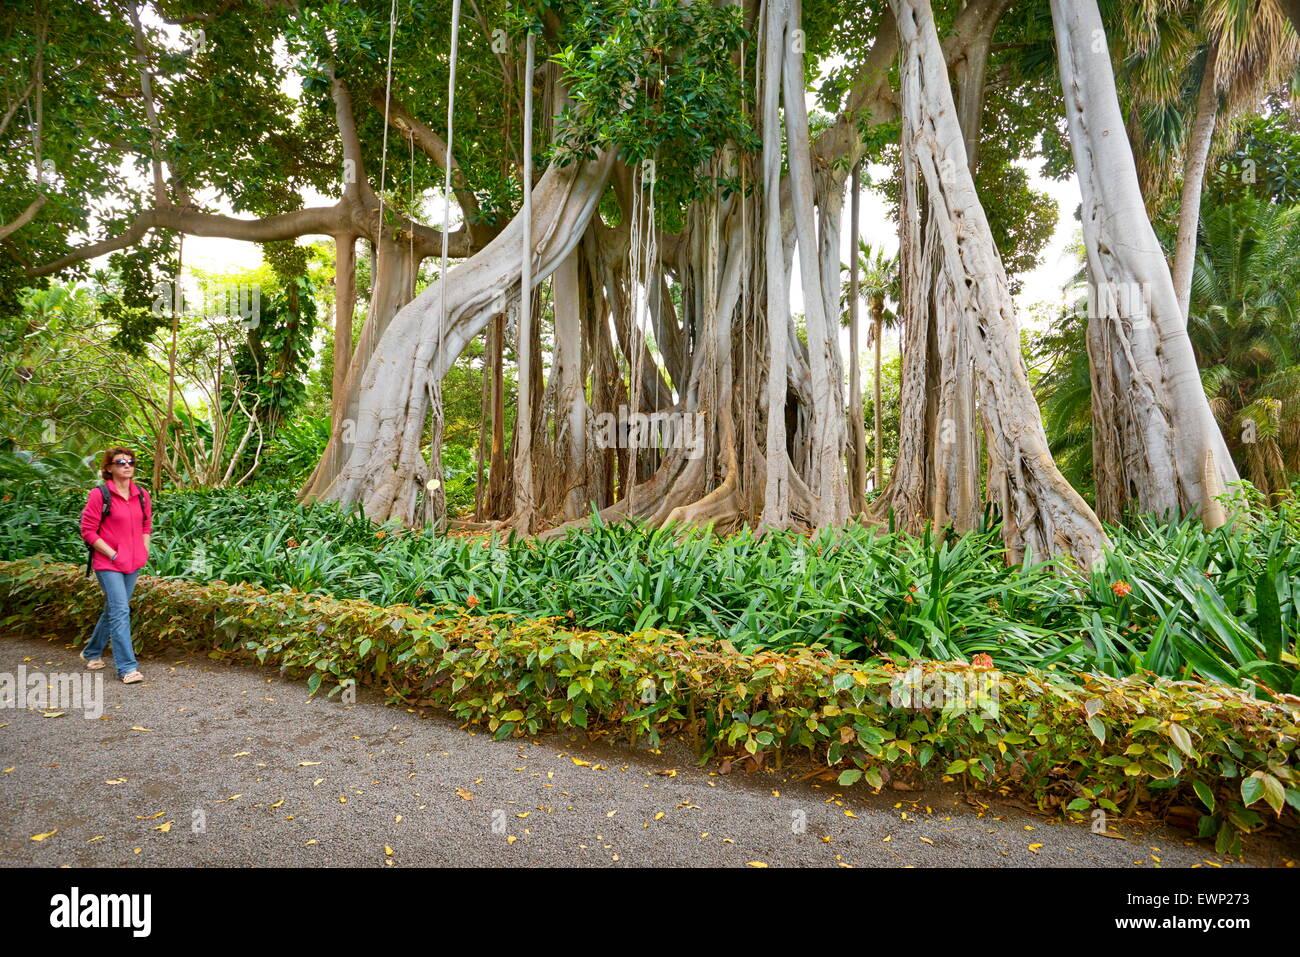 Ficus Tree, Botanic Garden, Puerto de la Cruz, Tenerife, Canary Islands, Spain - Stock Image